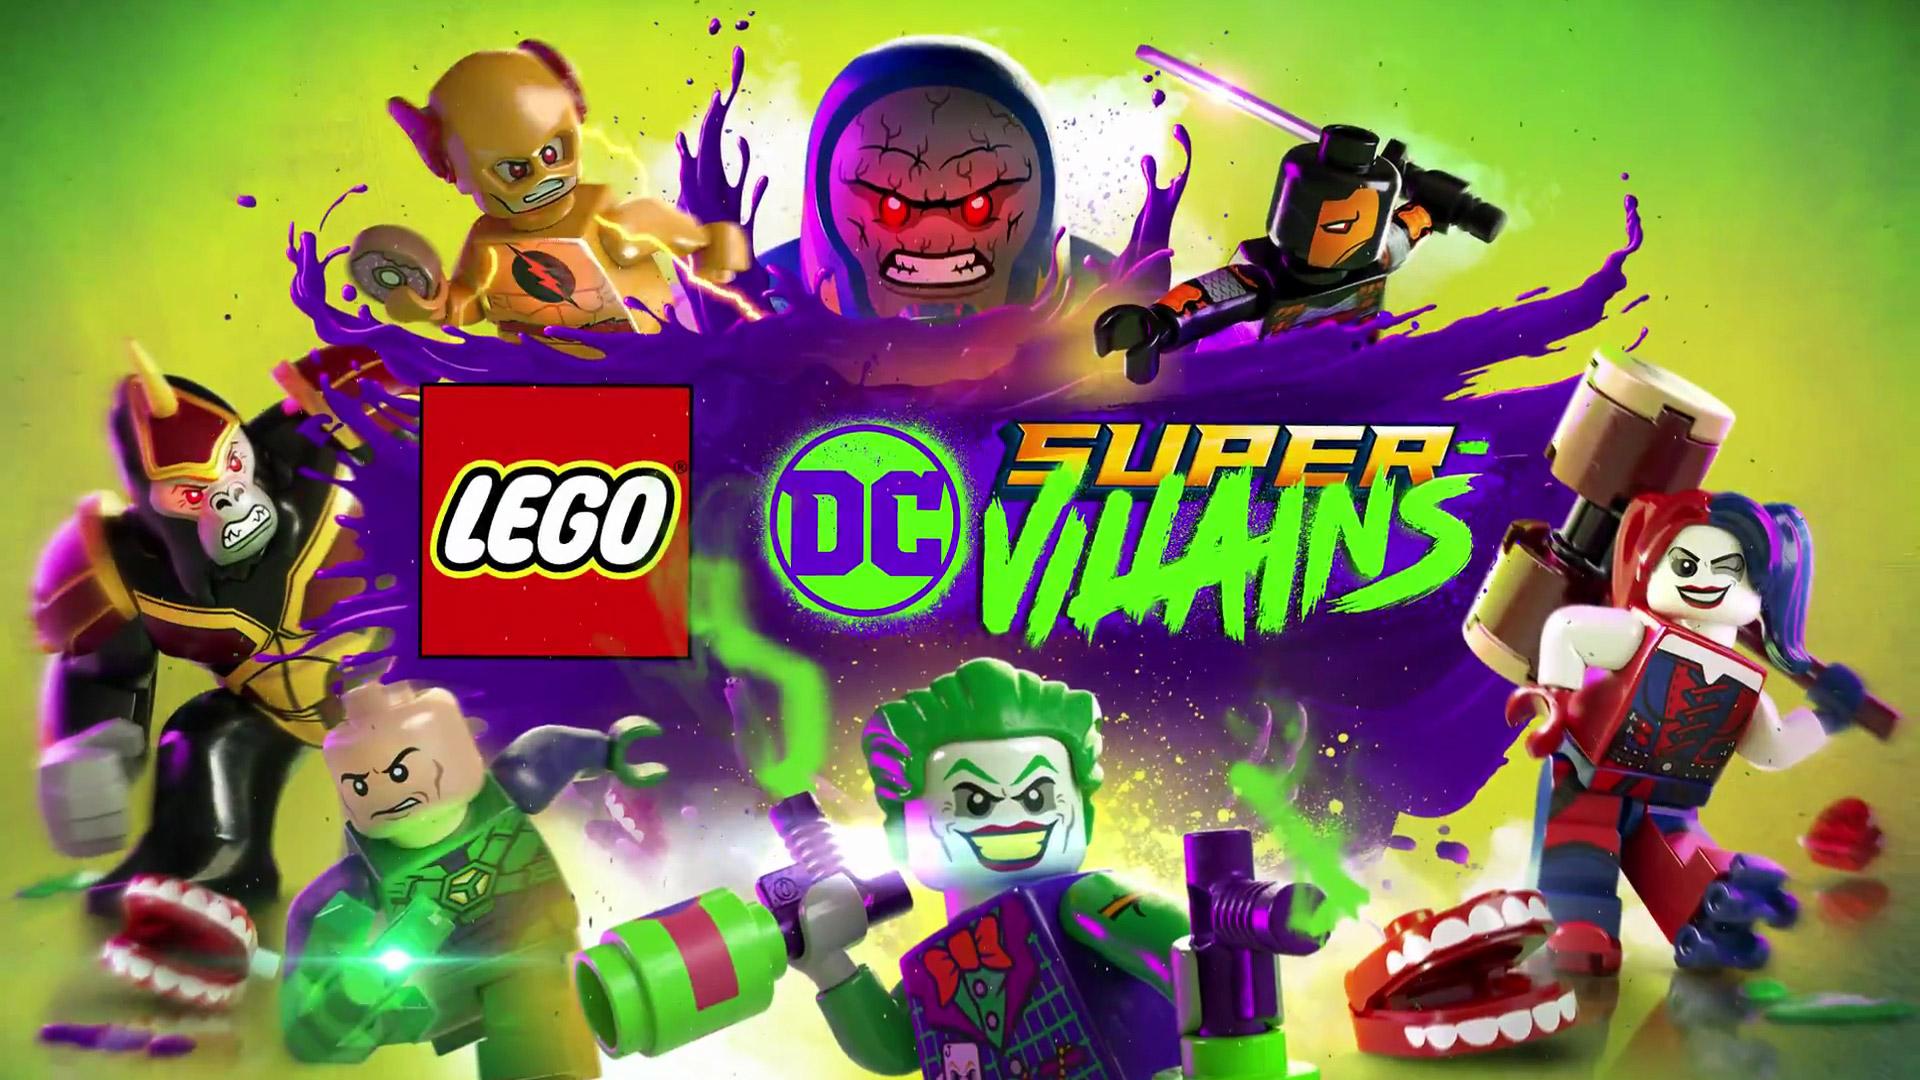 Lego DC Super Villains Wallpaper in 1920x1080